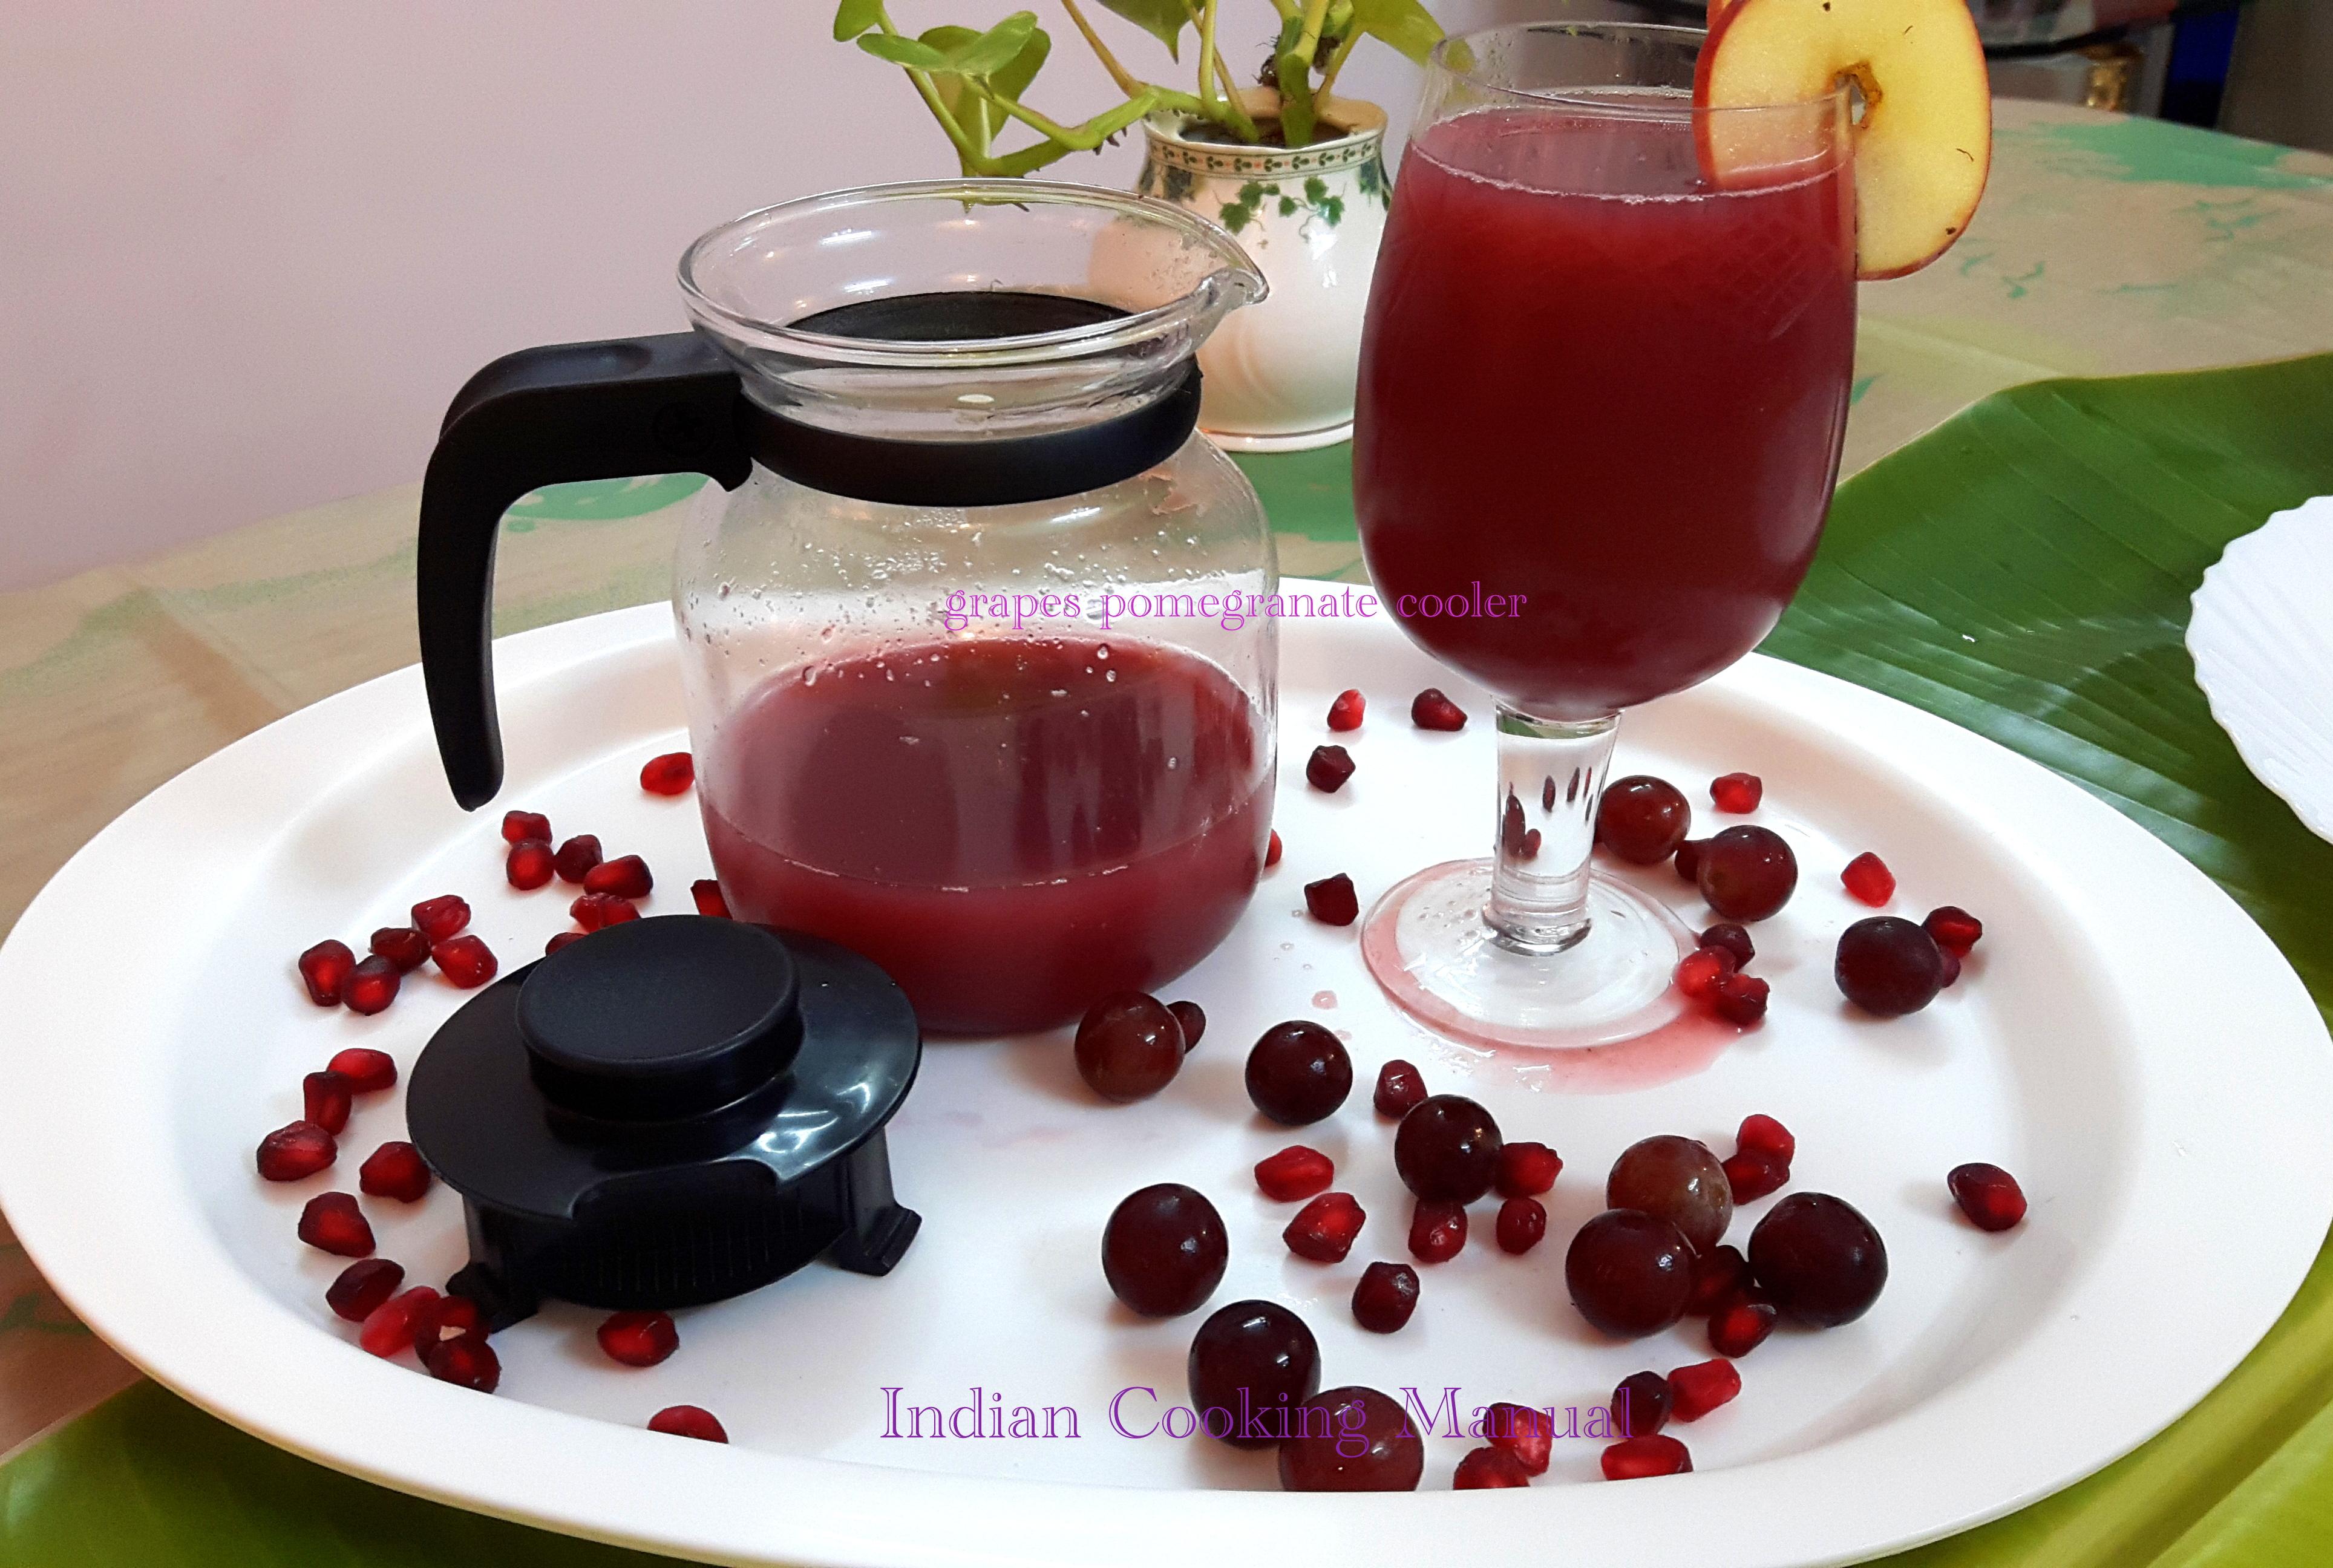 Grapes Pomegranate Cooler